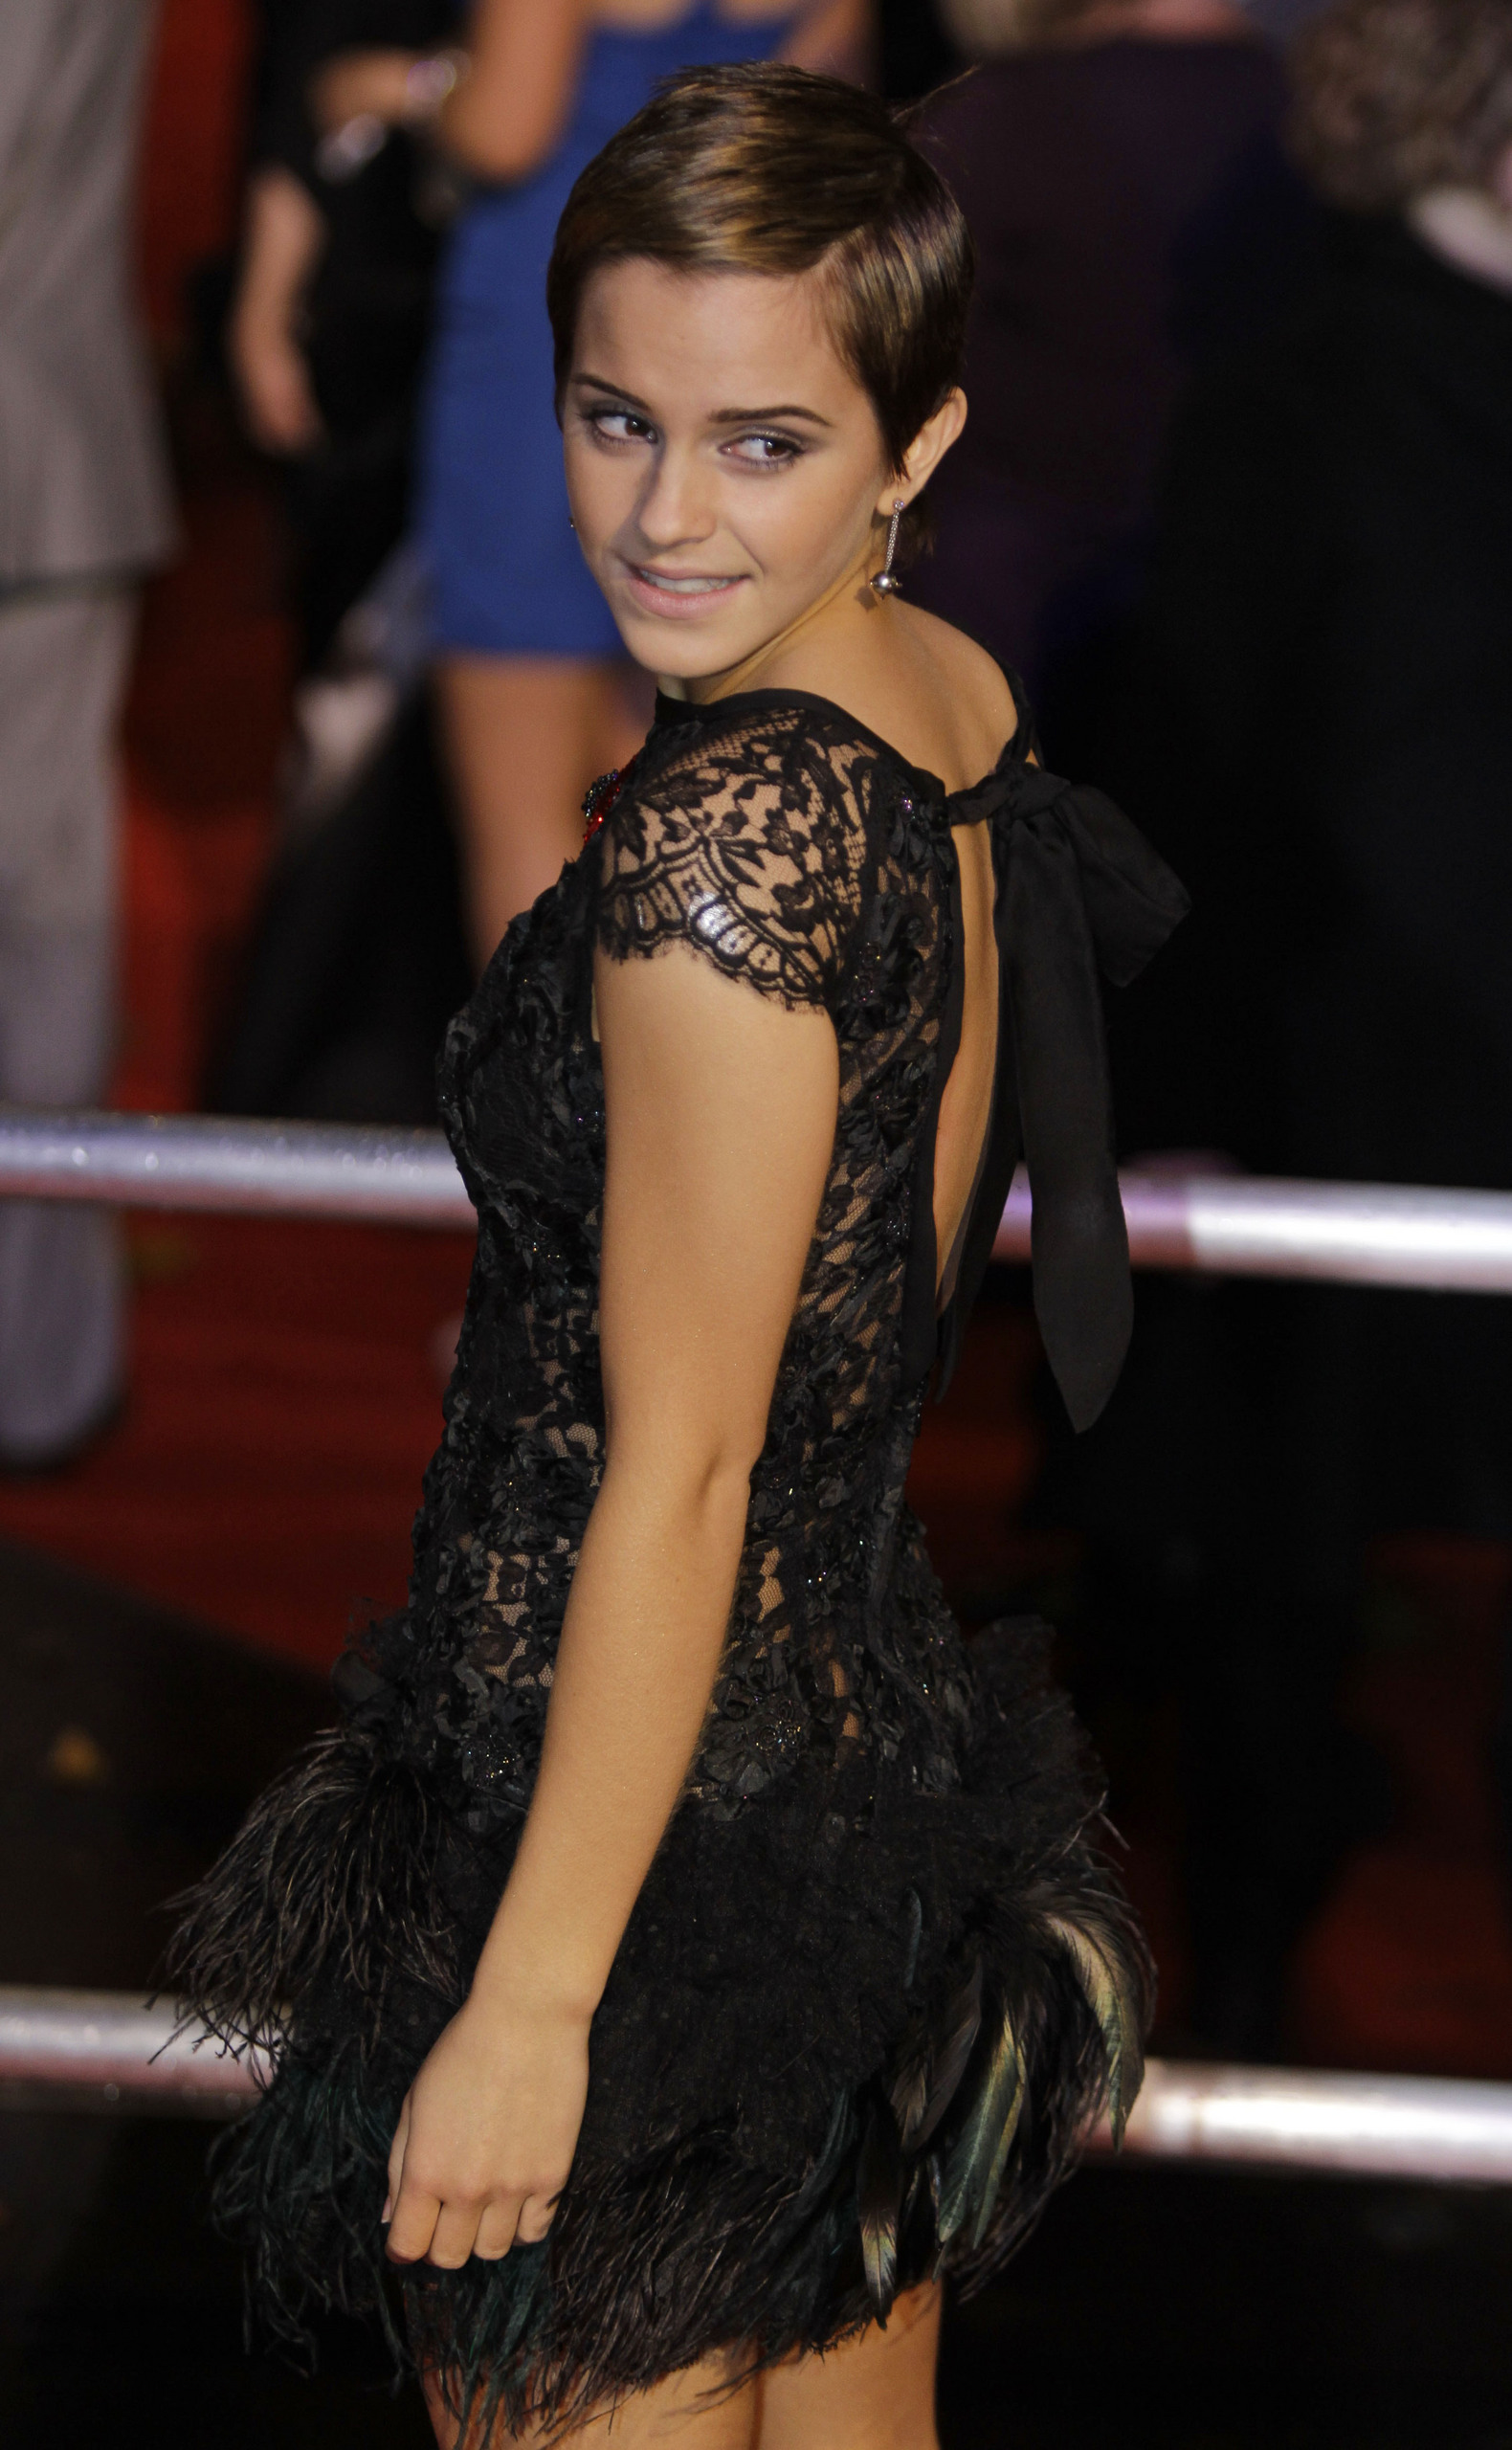 Emma Watson Harry Potter 7 premier Pt5